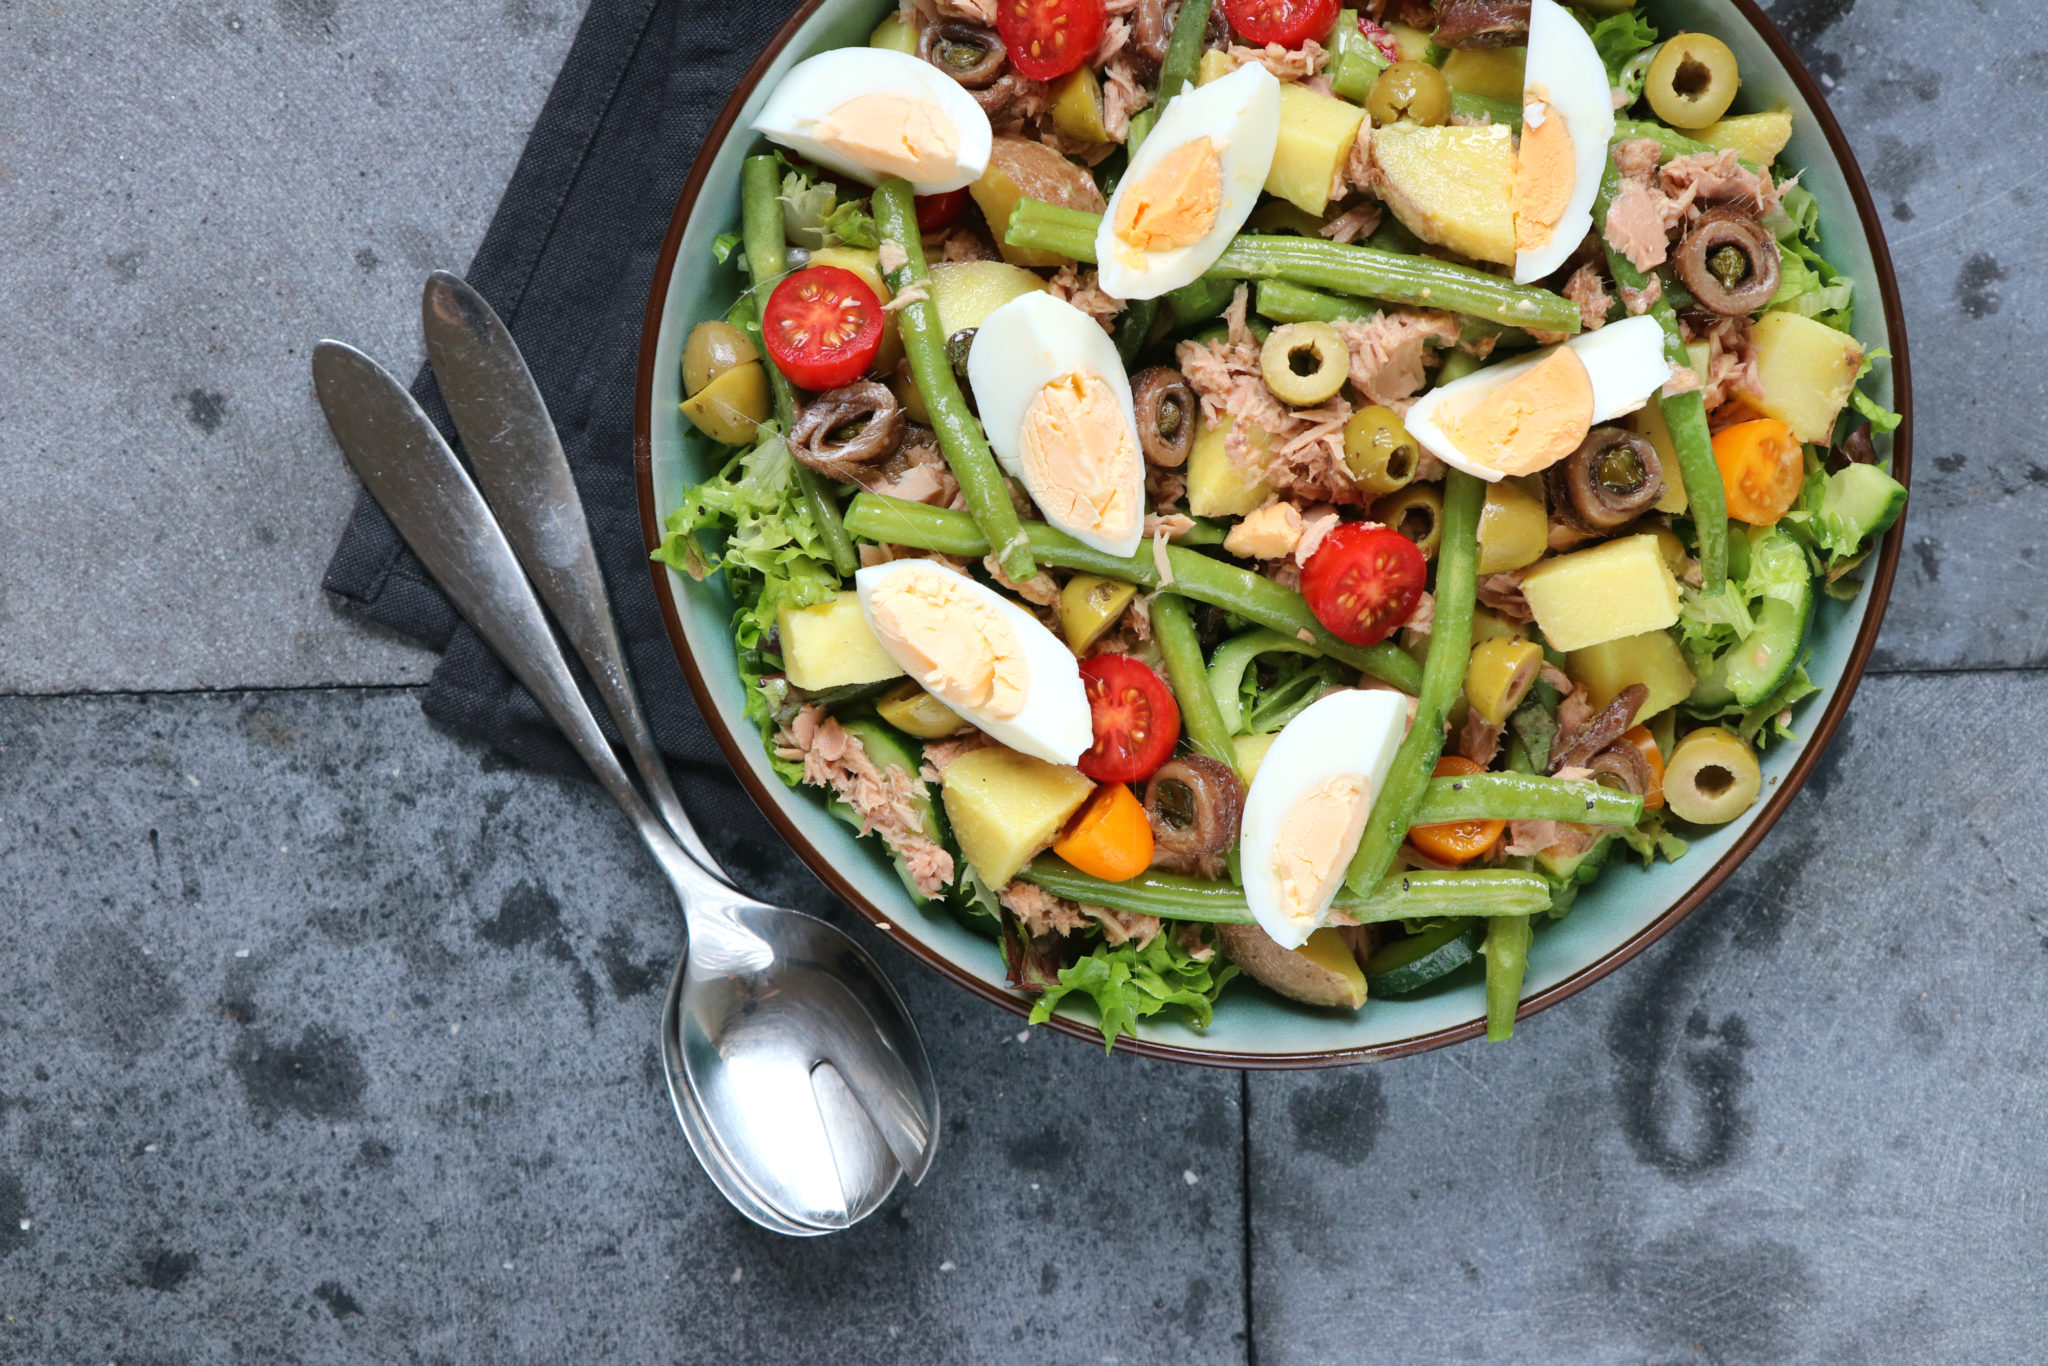 Recept salade nicoise met tonijn www.jaimyskitchen.nl